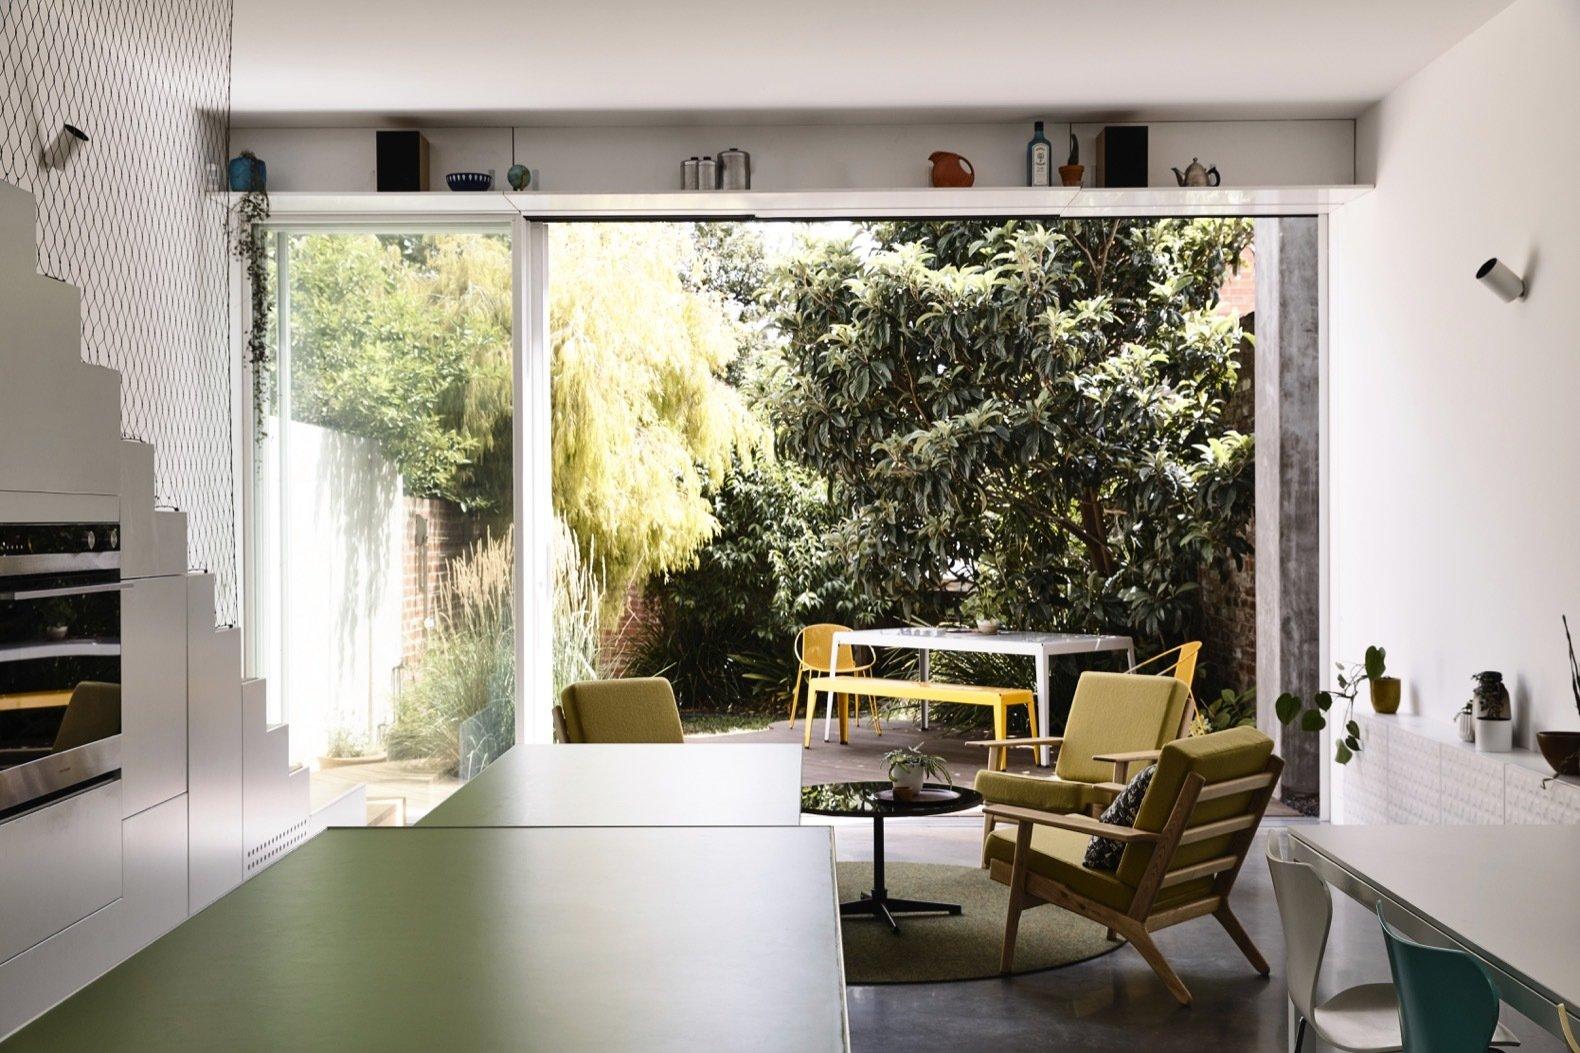 Grant House living room